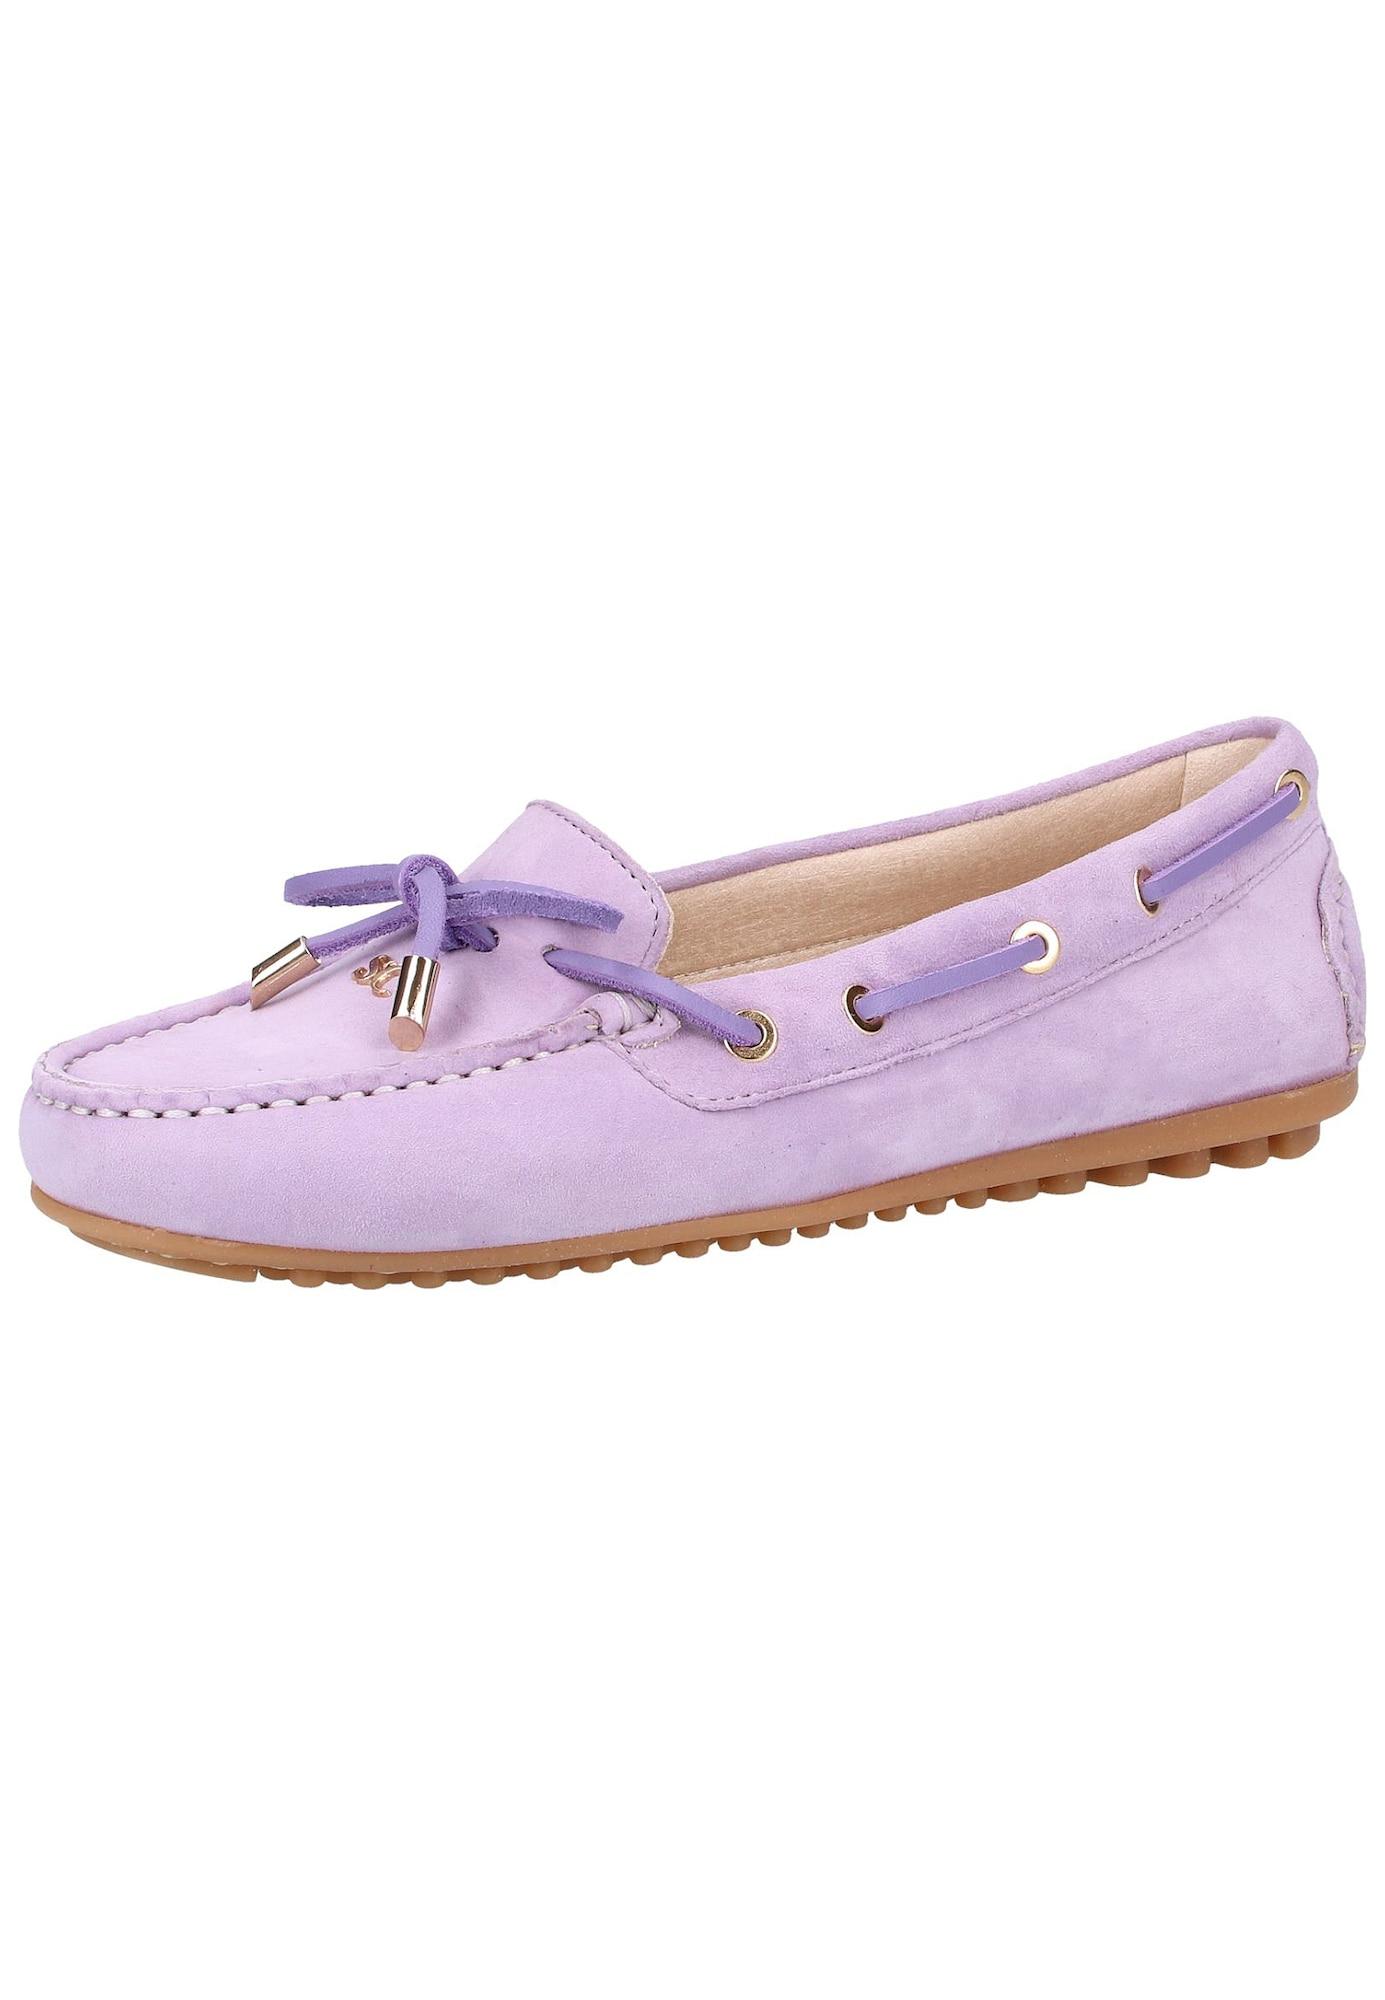 Mokassin | Schuhe > Mokassins | SCAPA